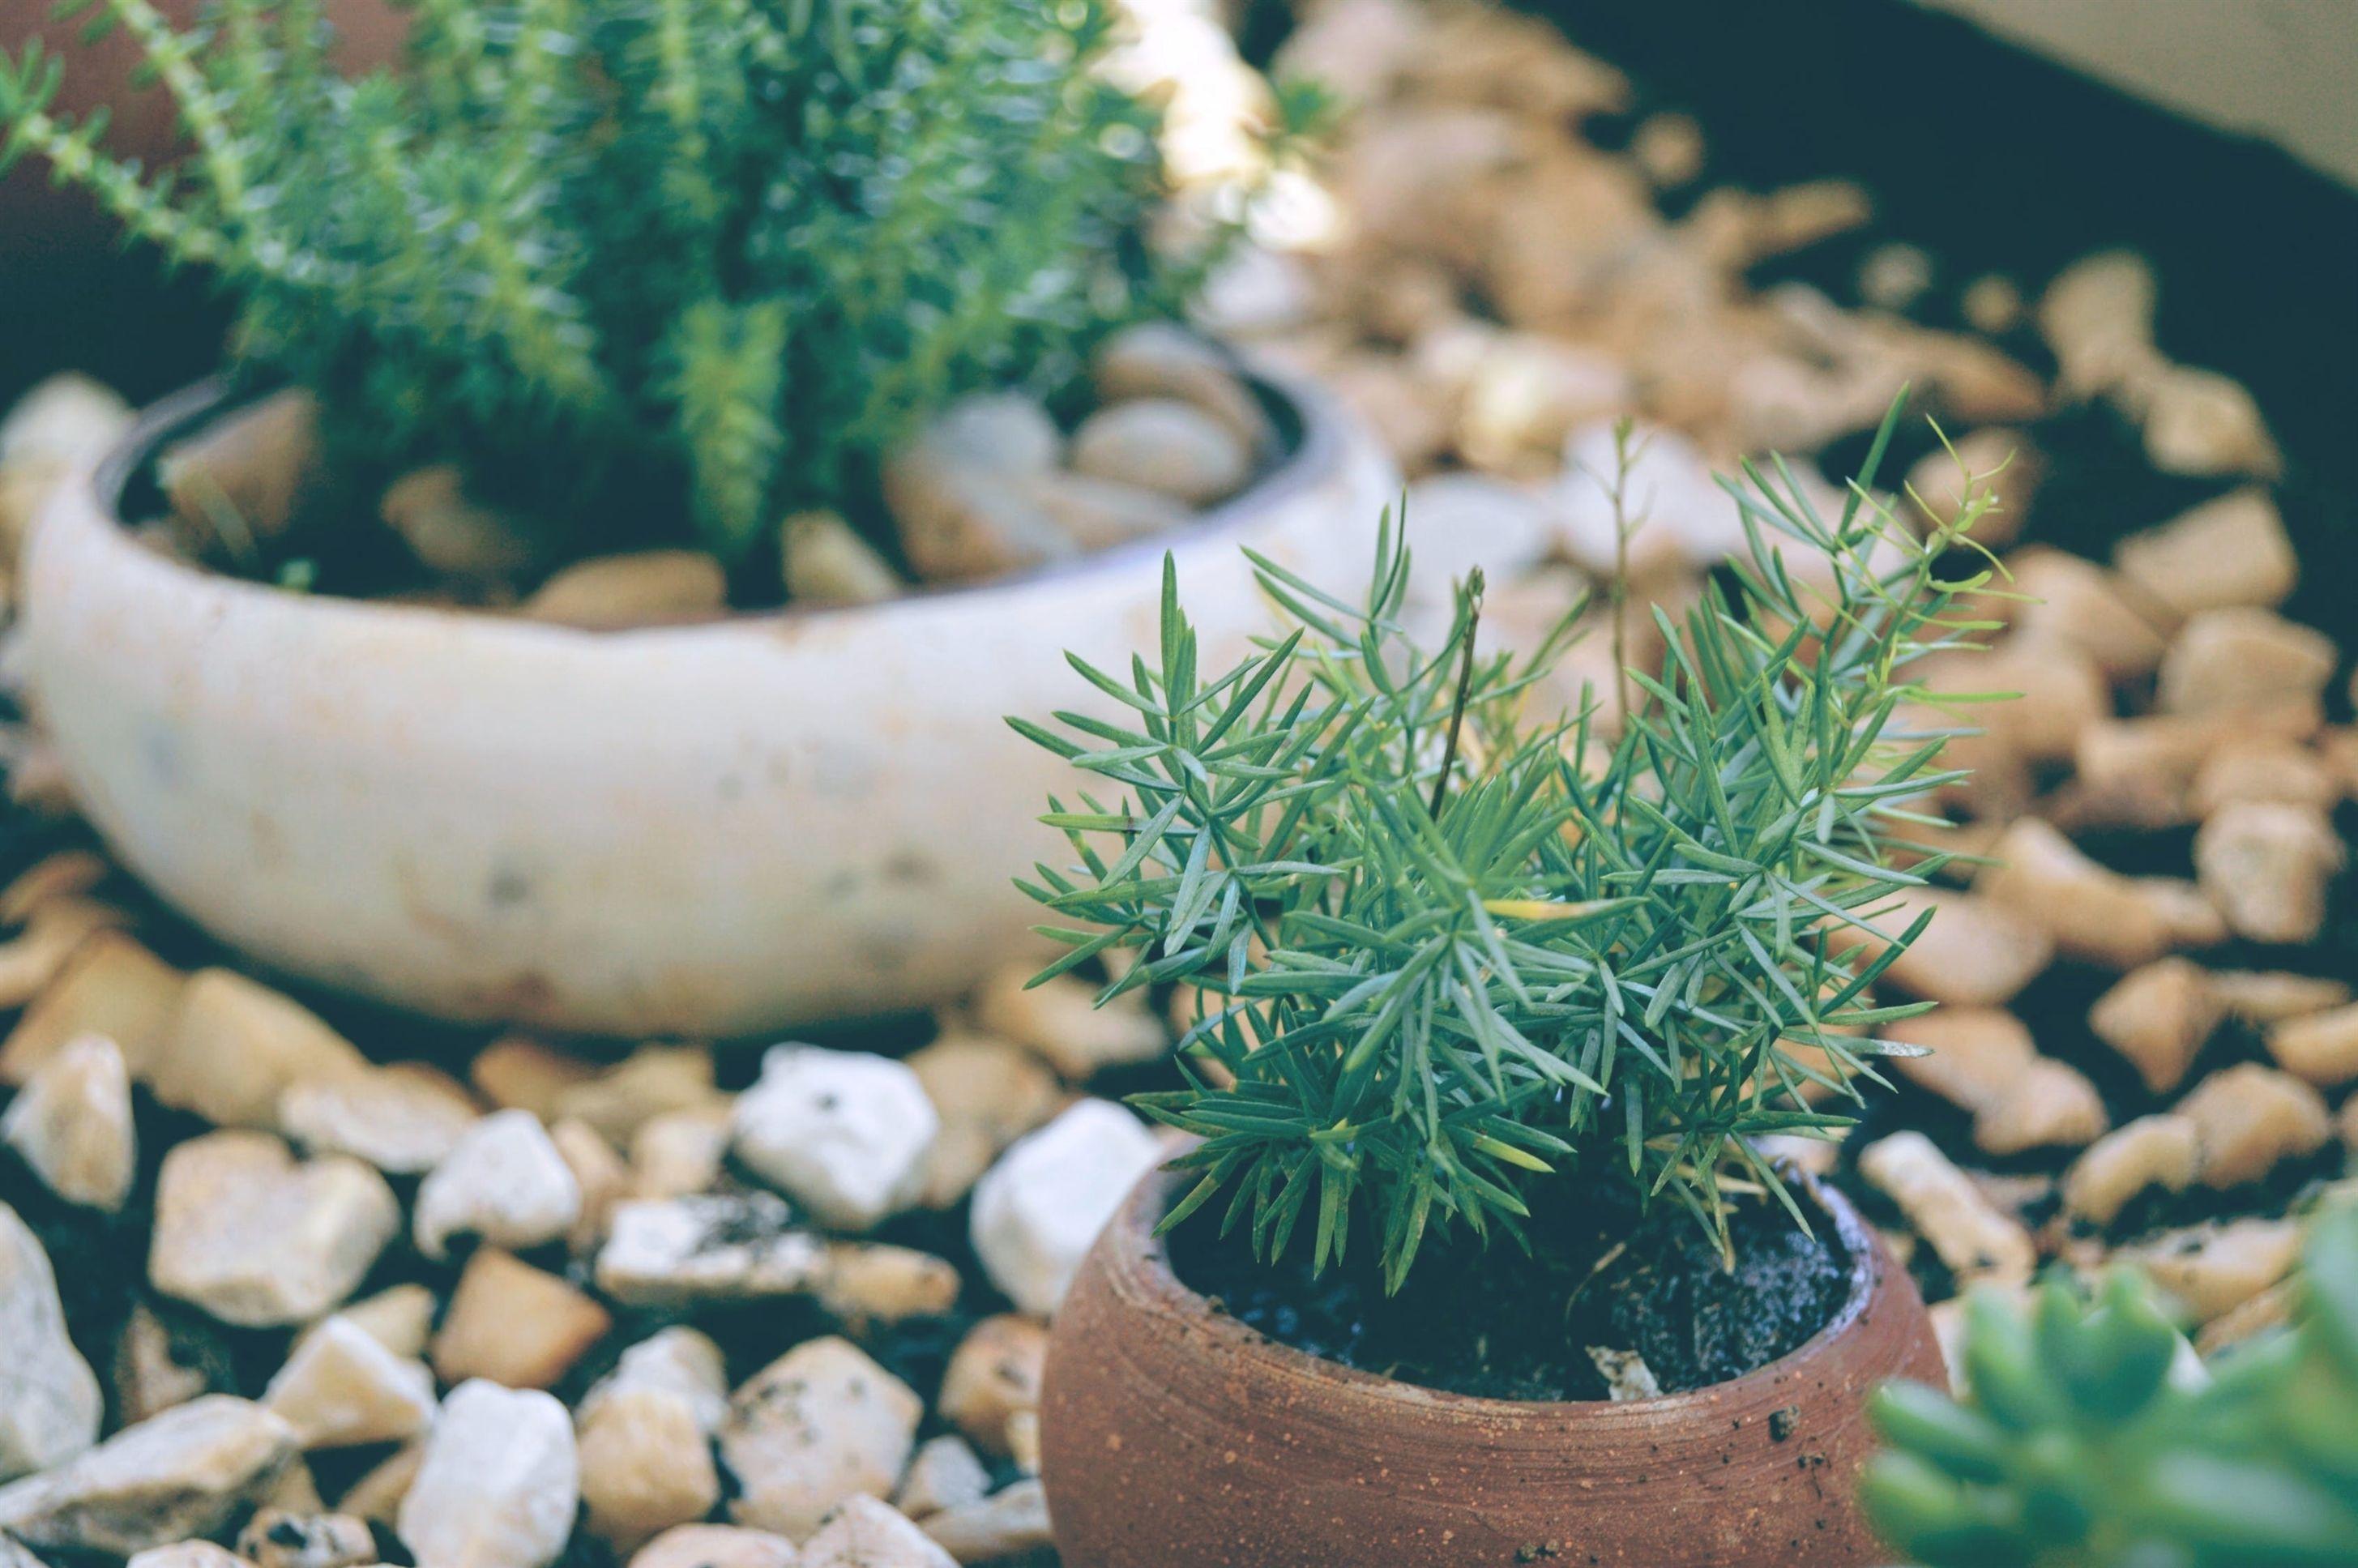 inexpensive gardening gift basket ideas for women_5758